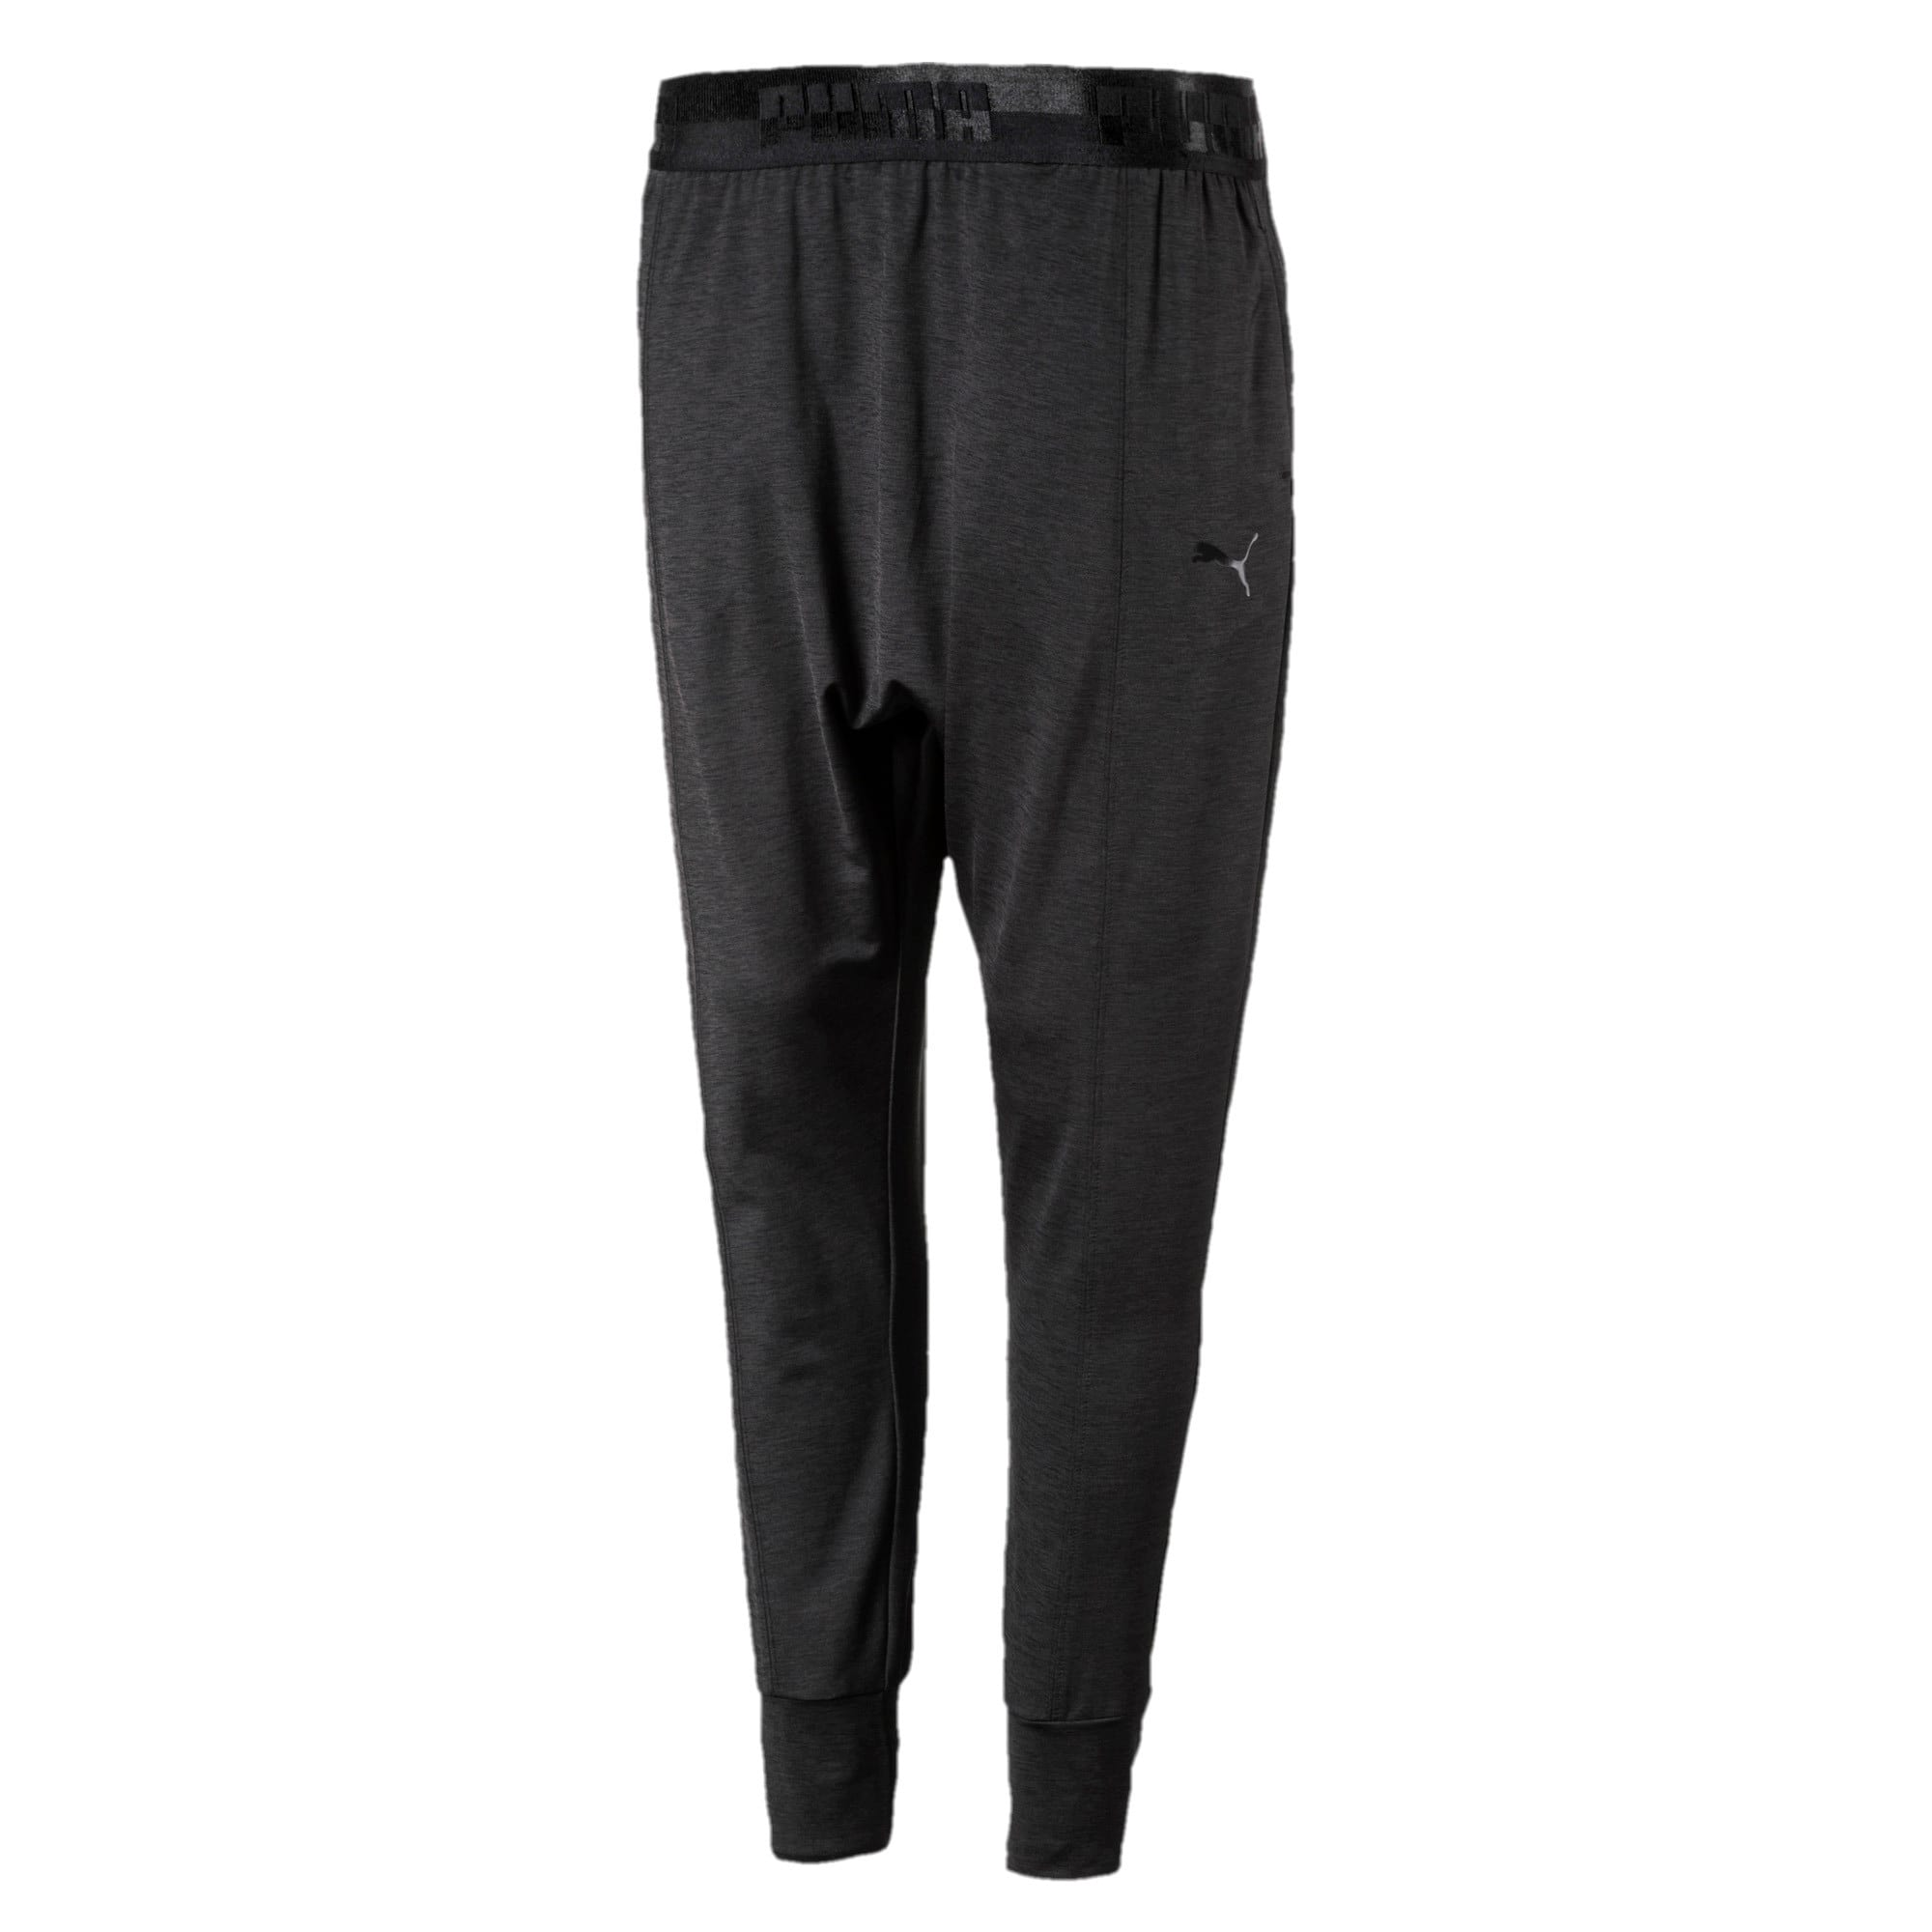 Thumbnail 1 of Soft Sport Women's Sweatpants, Puma Black-heather, medium